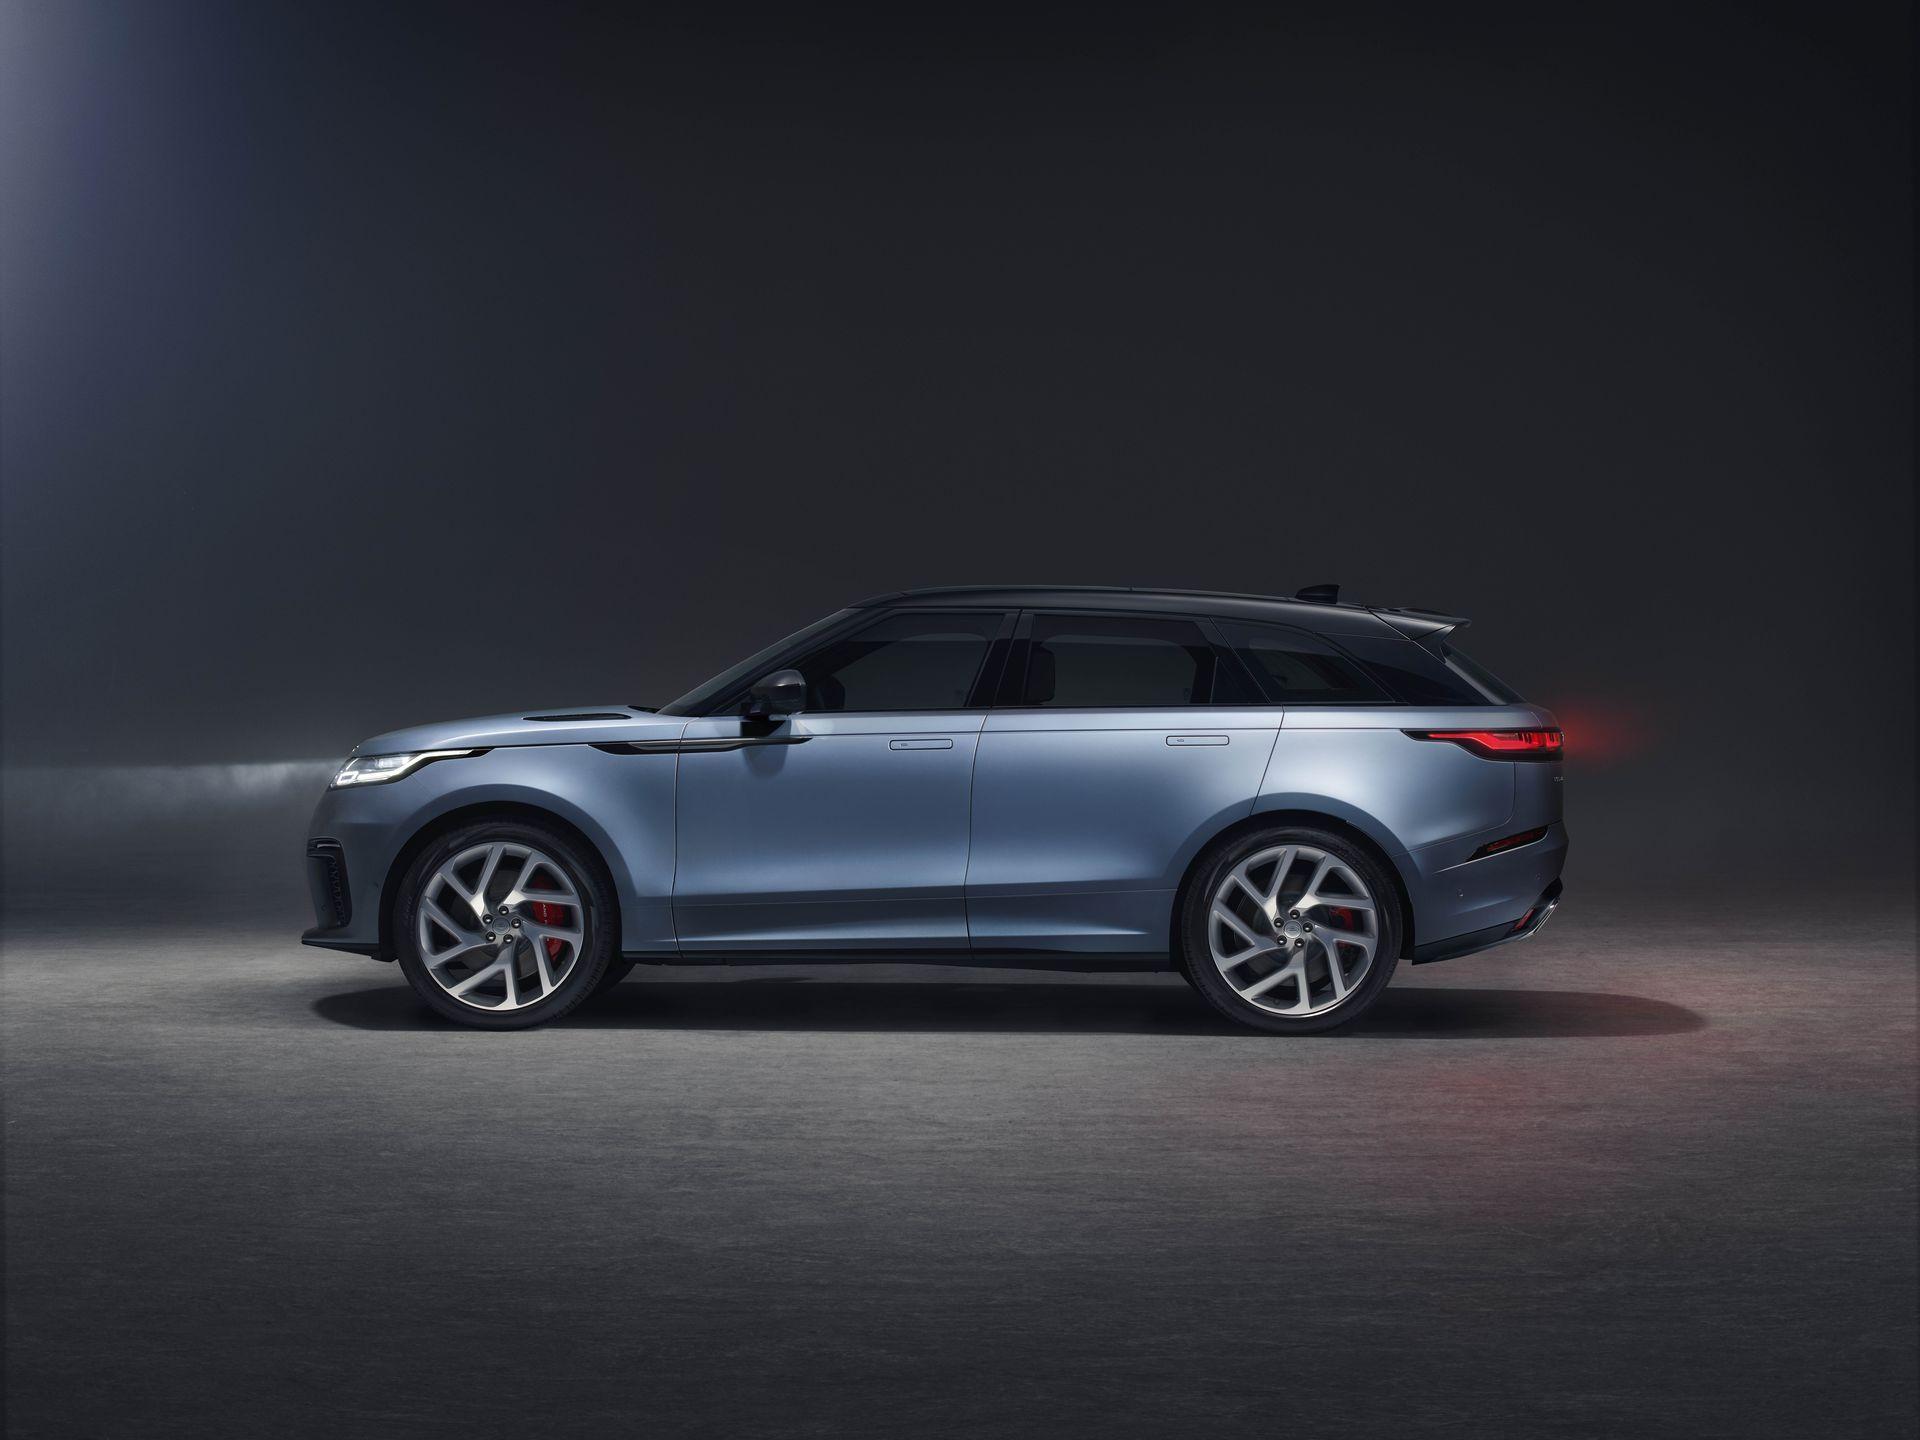 Range Rover Velar Svautobiography 3